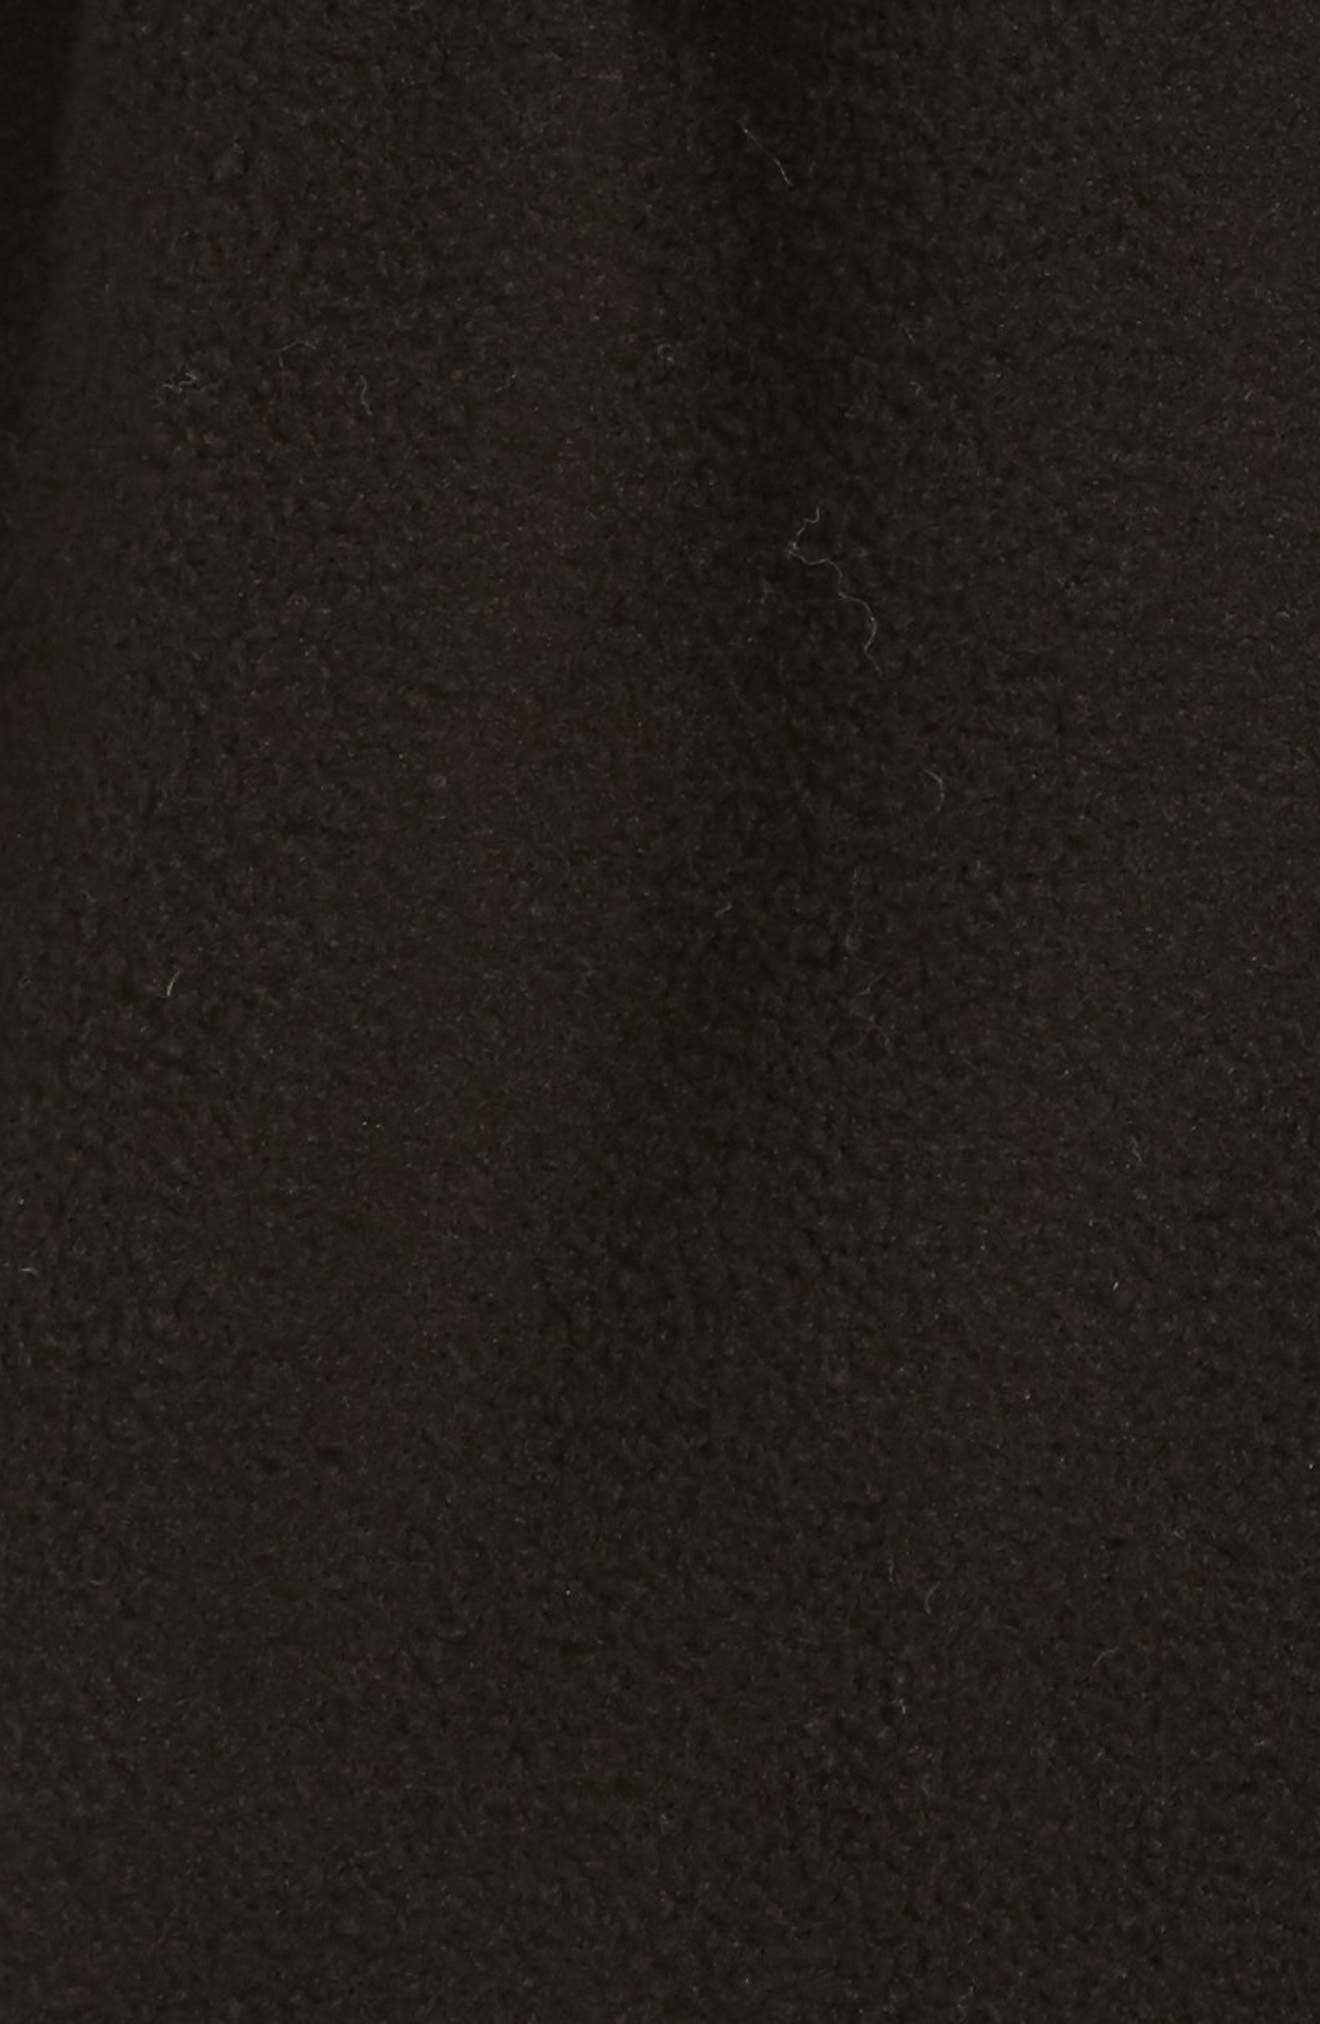 Knit Collar Fleece Boot Socks,                             Alternate thumbnail 2, color,                             002